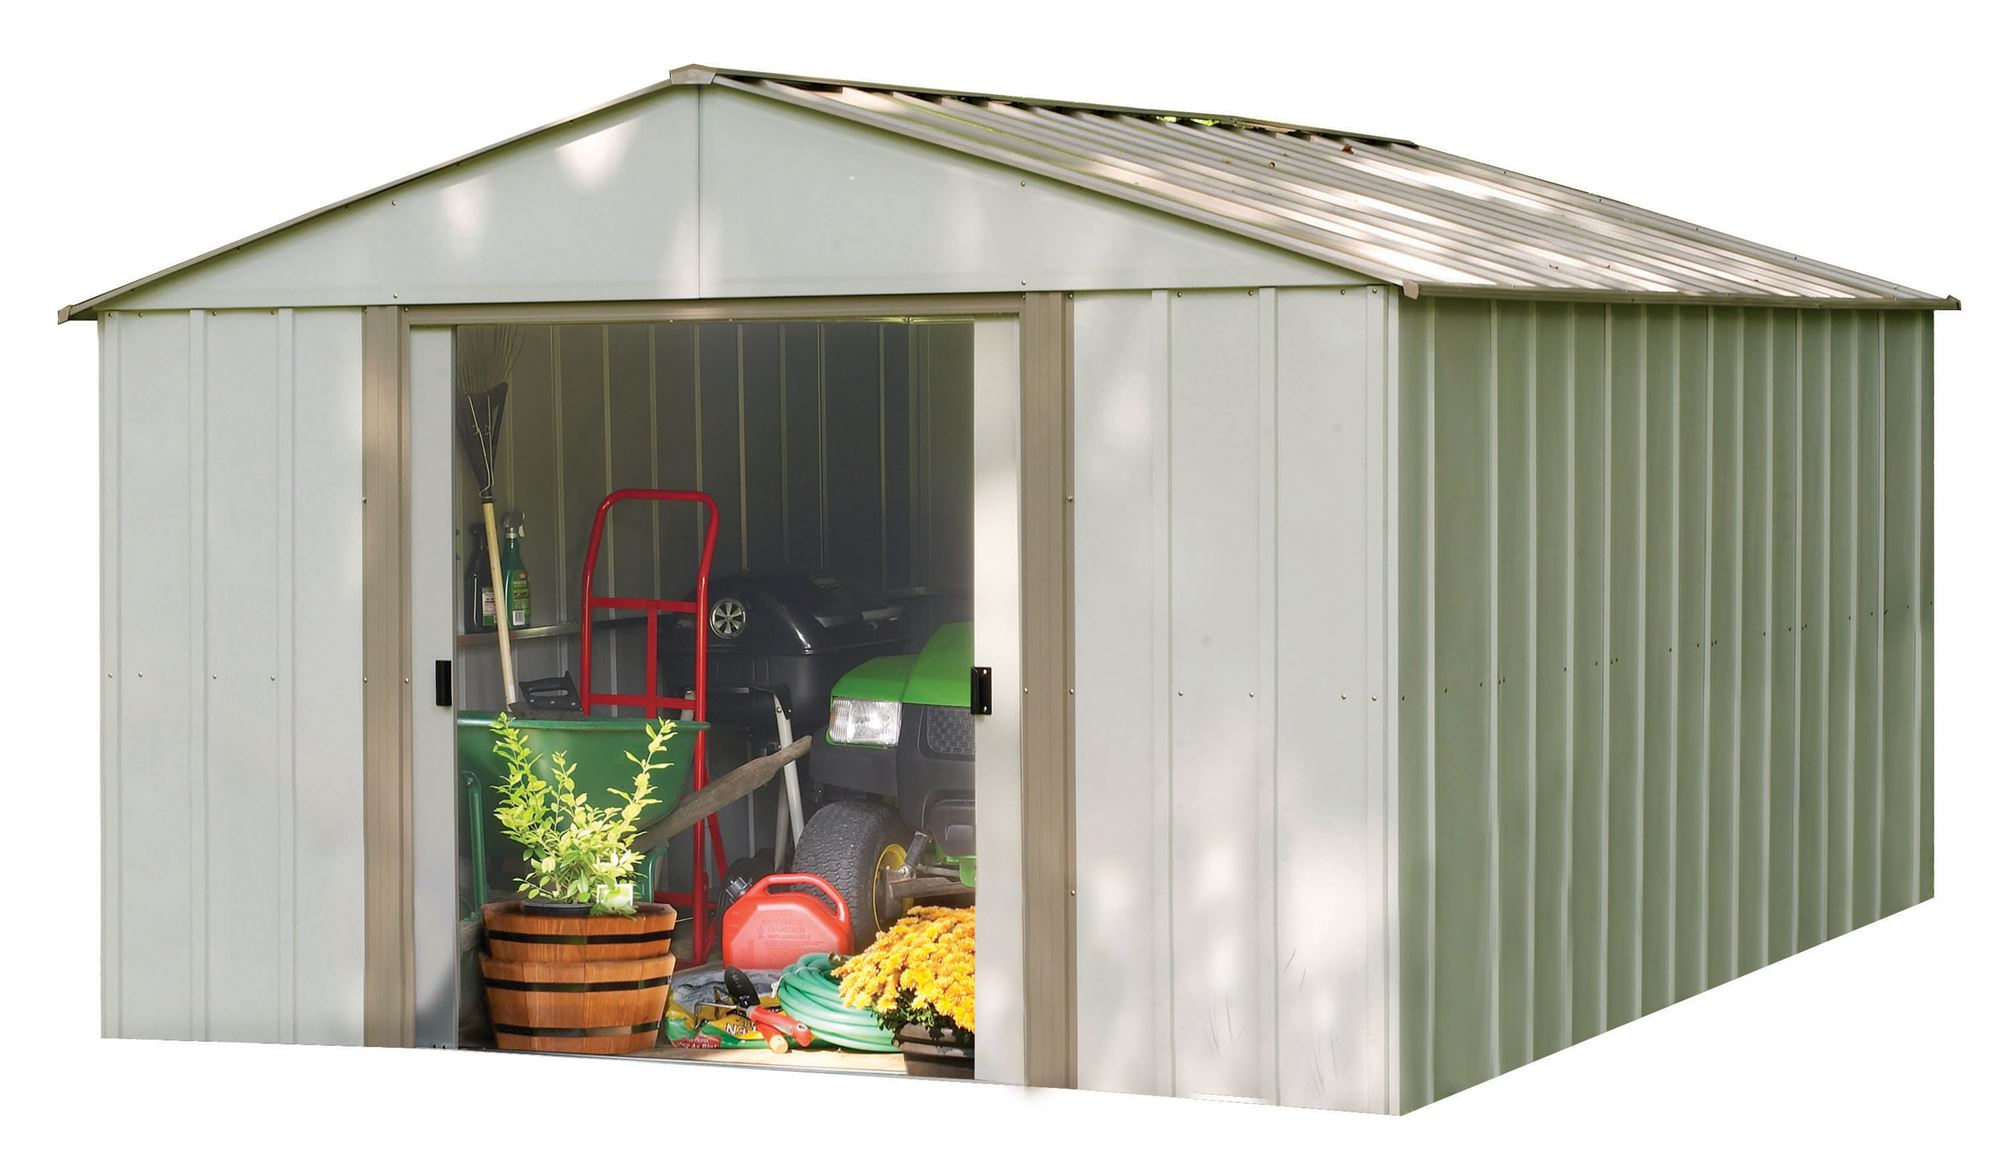 Abri De Jardin 12M2 - Canalcncarauca pour Abri De Jardin Aluminium